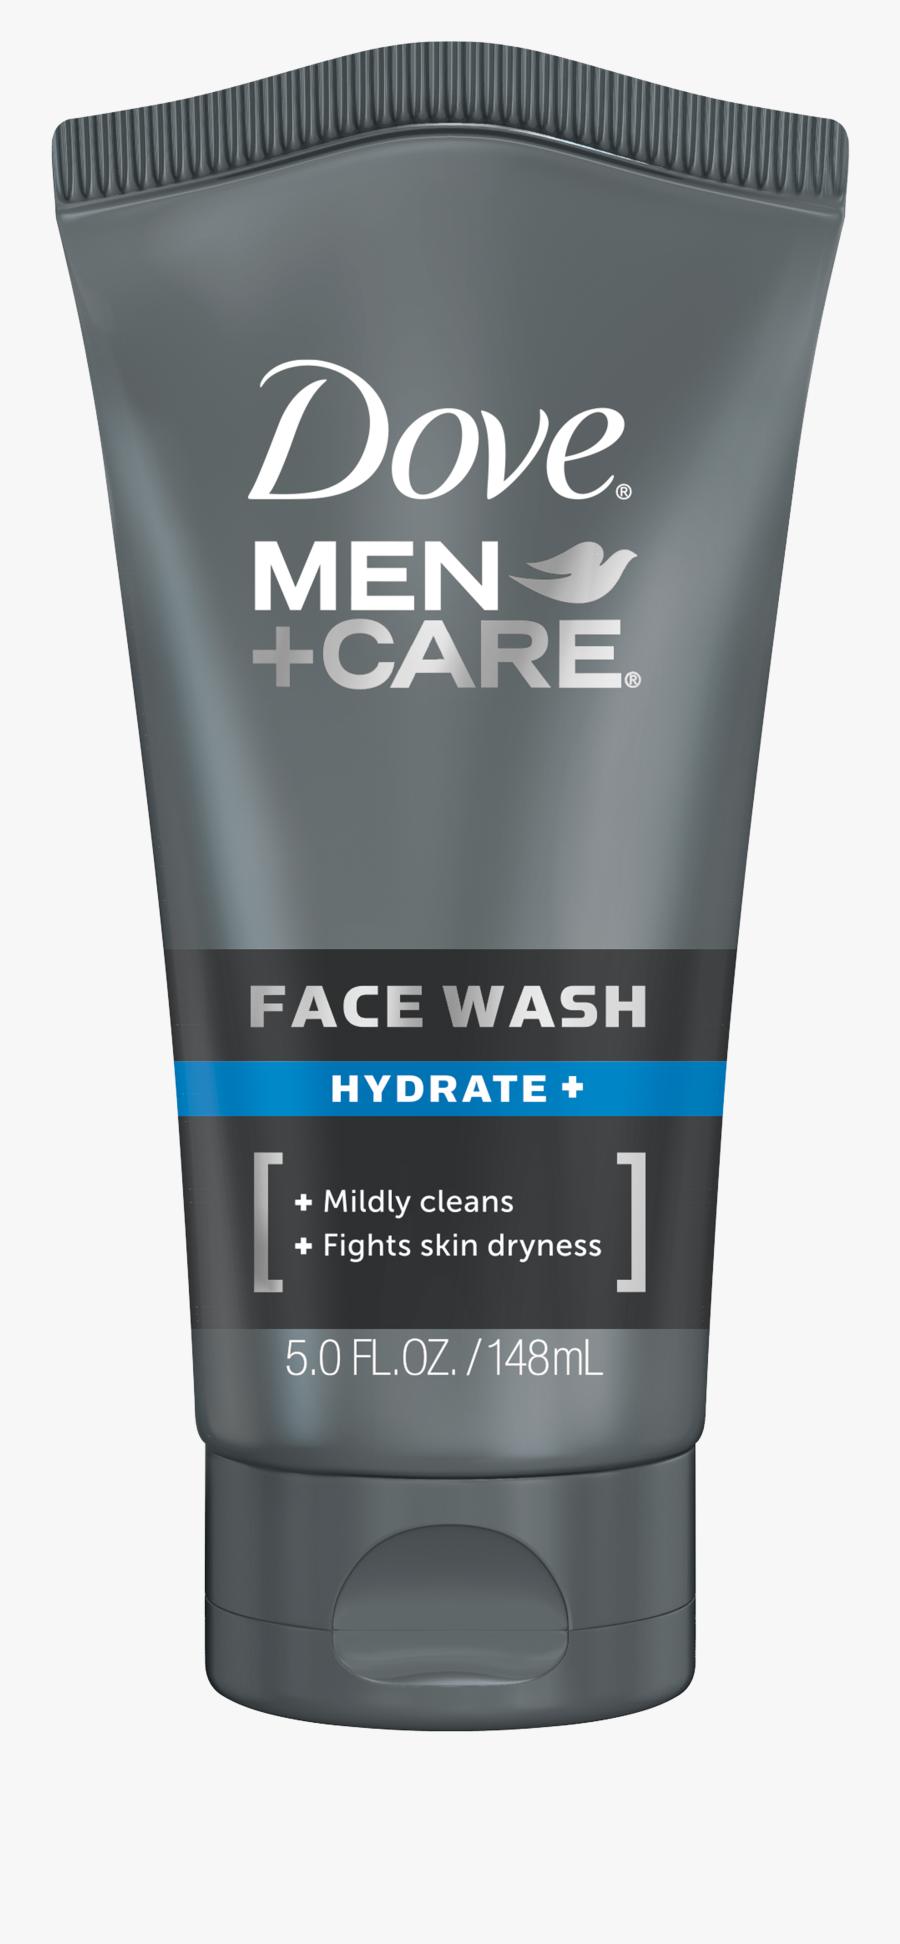 Men Care Sensitive Face - Dove Men Facial Wash, Transparent Clipart